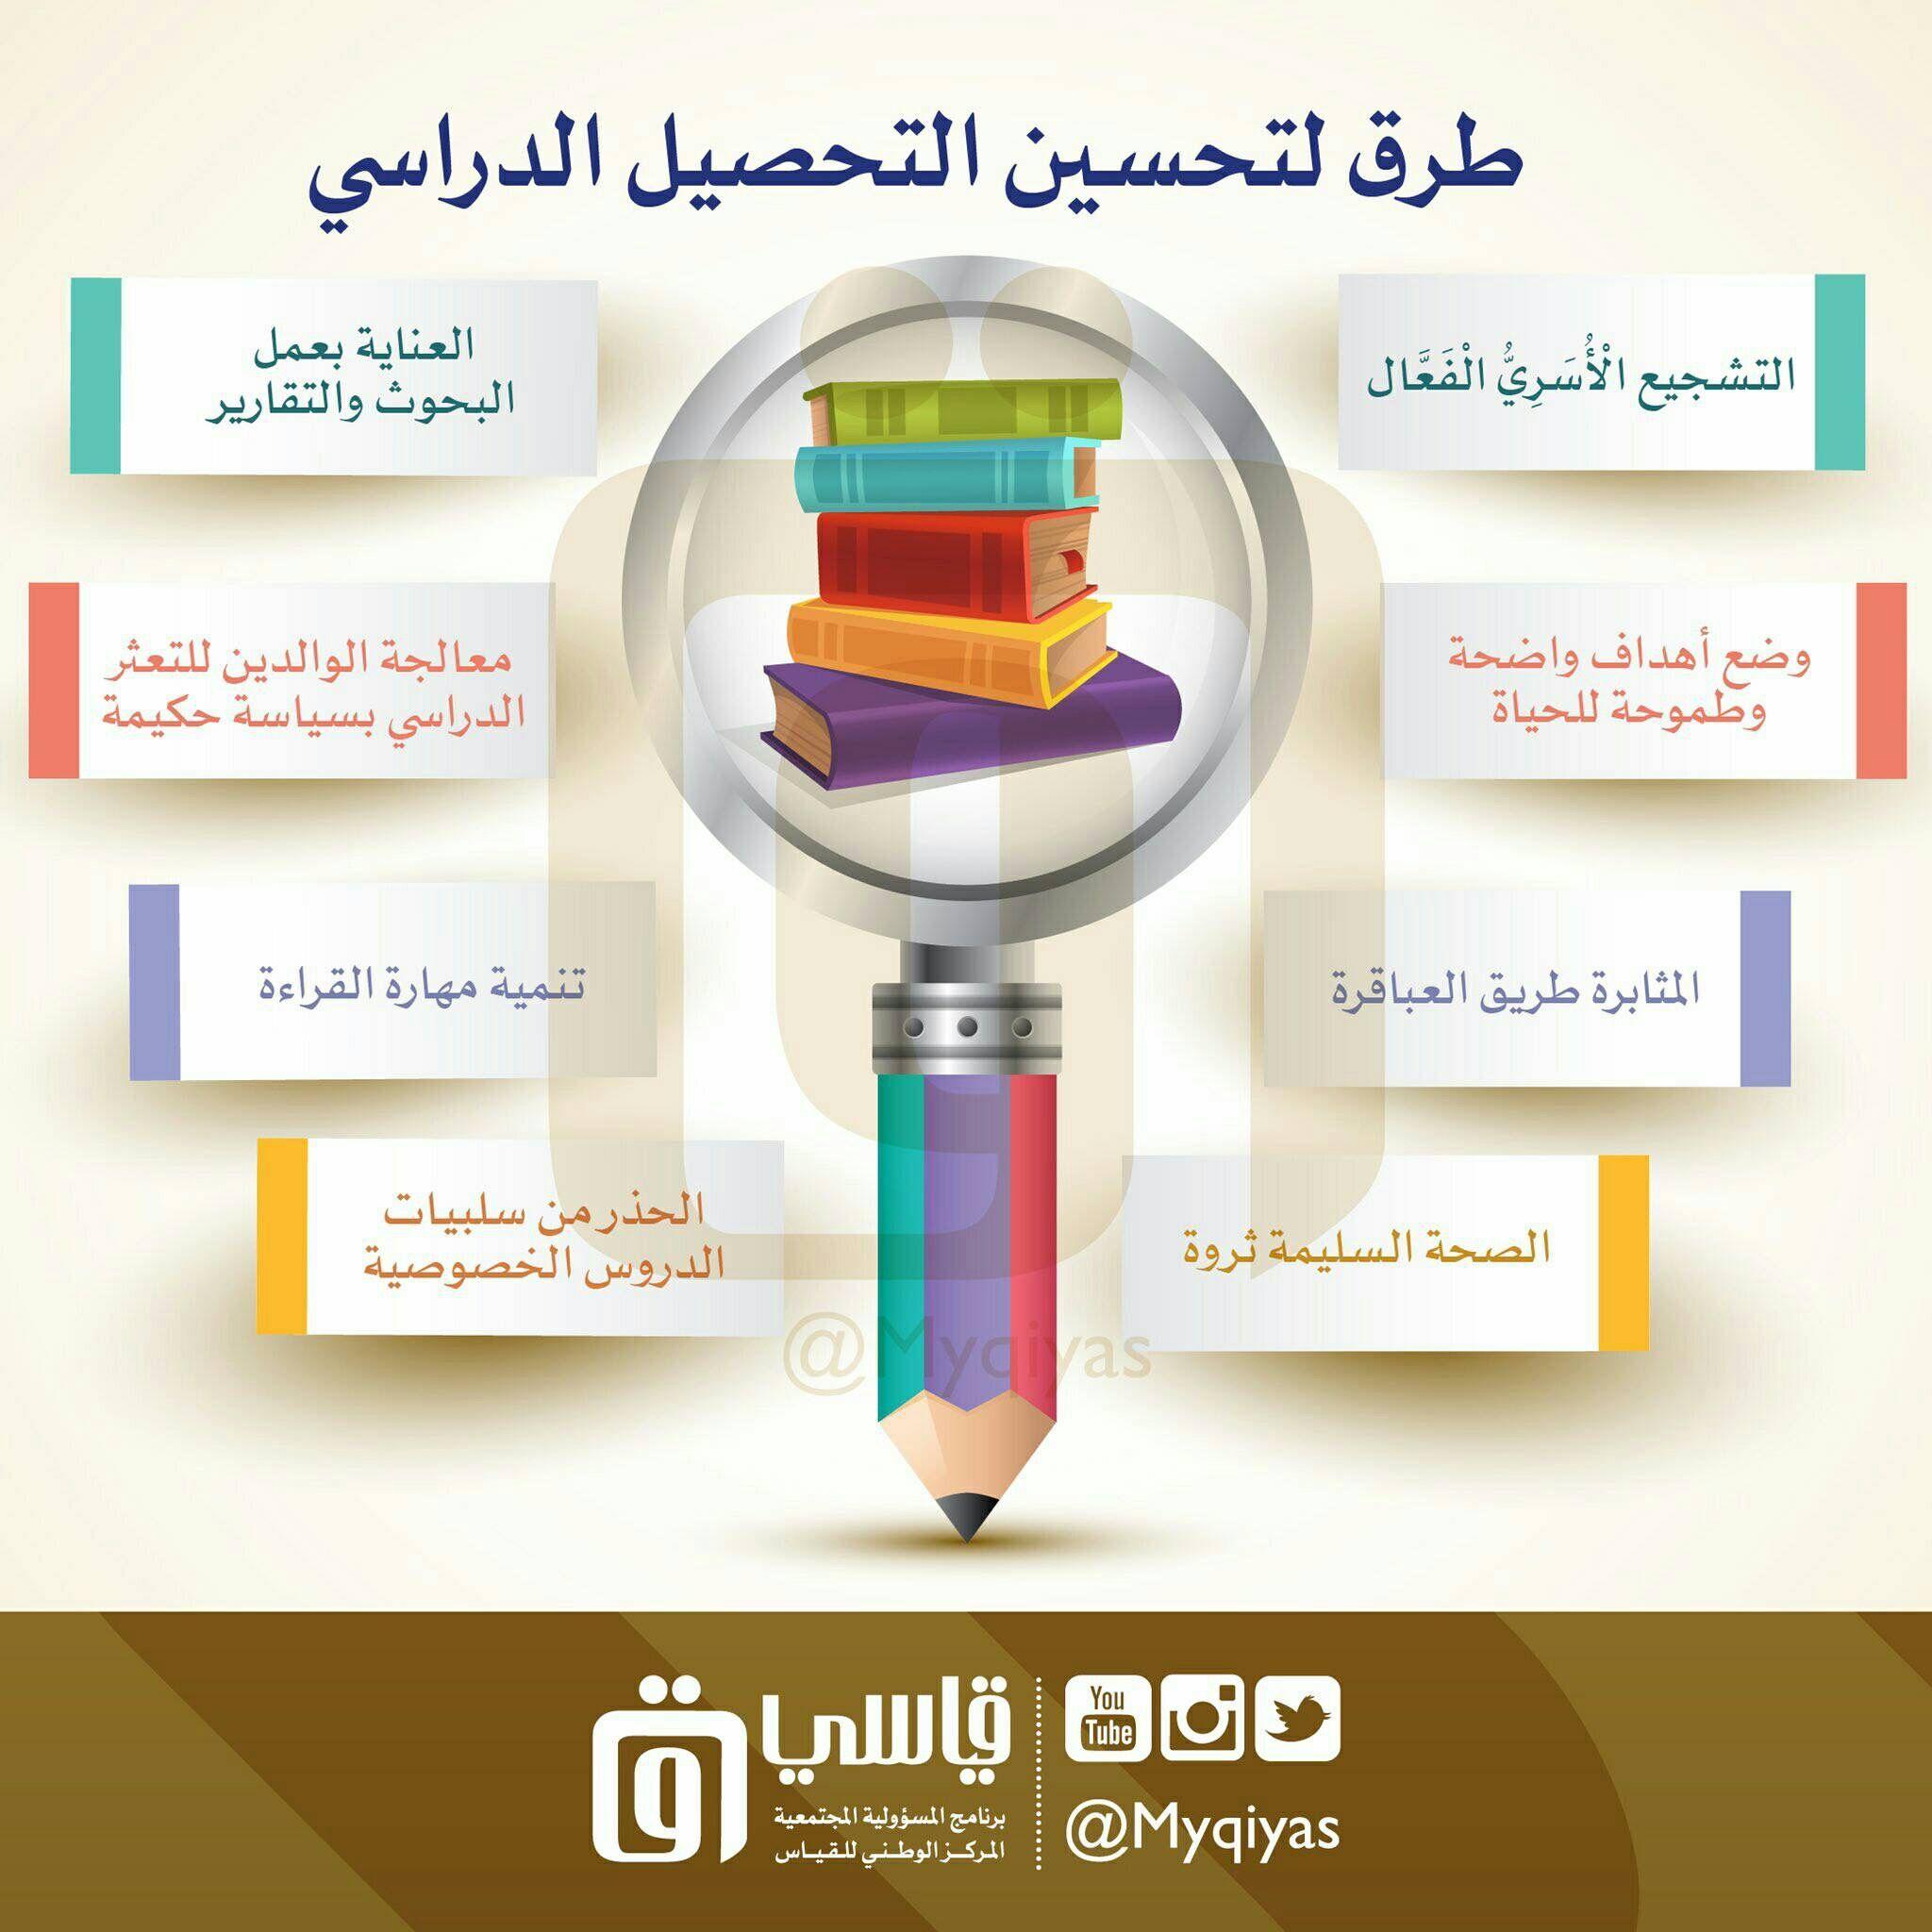 Pin by Ali on تطوير الذات | Learning arabic, Learning